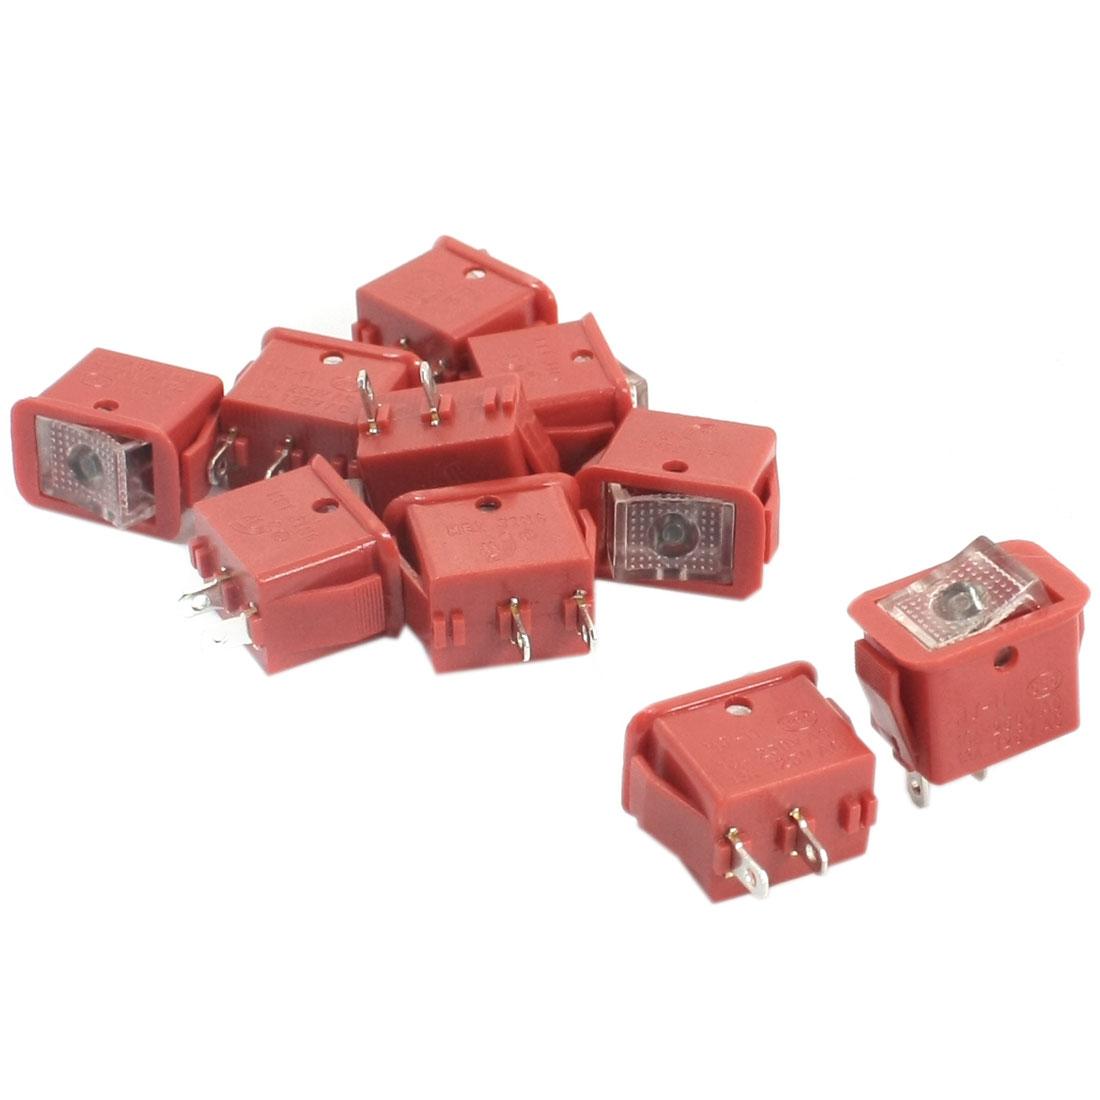 10PCS SPST 2 Position Self-Locking 2-Terminal Panel Mount Rocker Switch Red